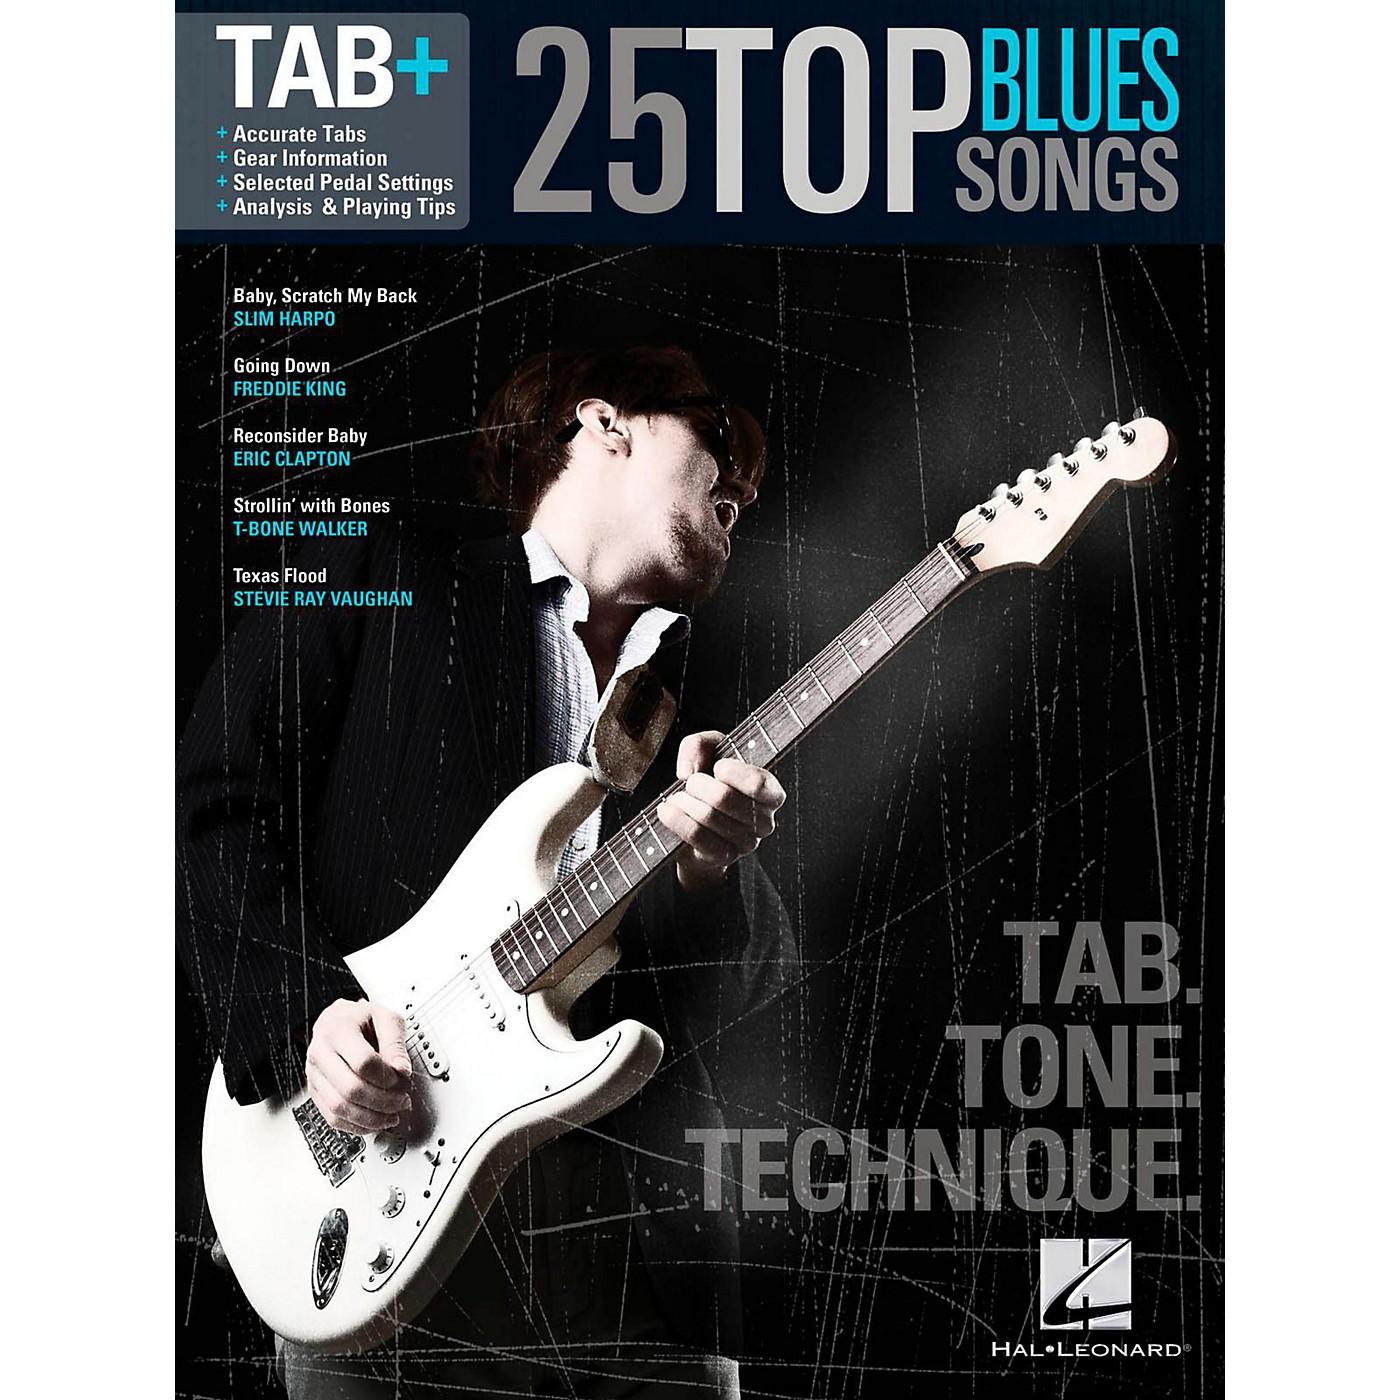 Hal Leonard 25 Top Blues Songs - Tab. Tone. Technique. thumbnail